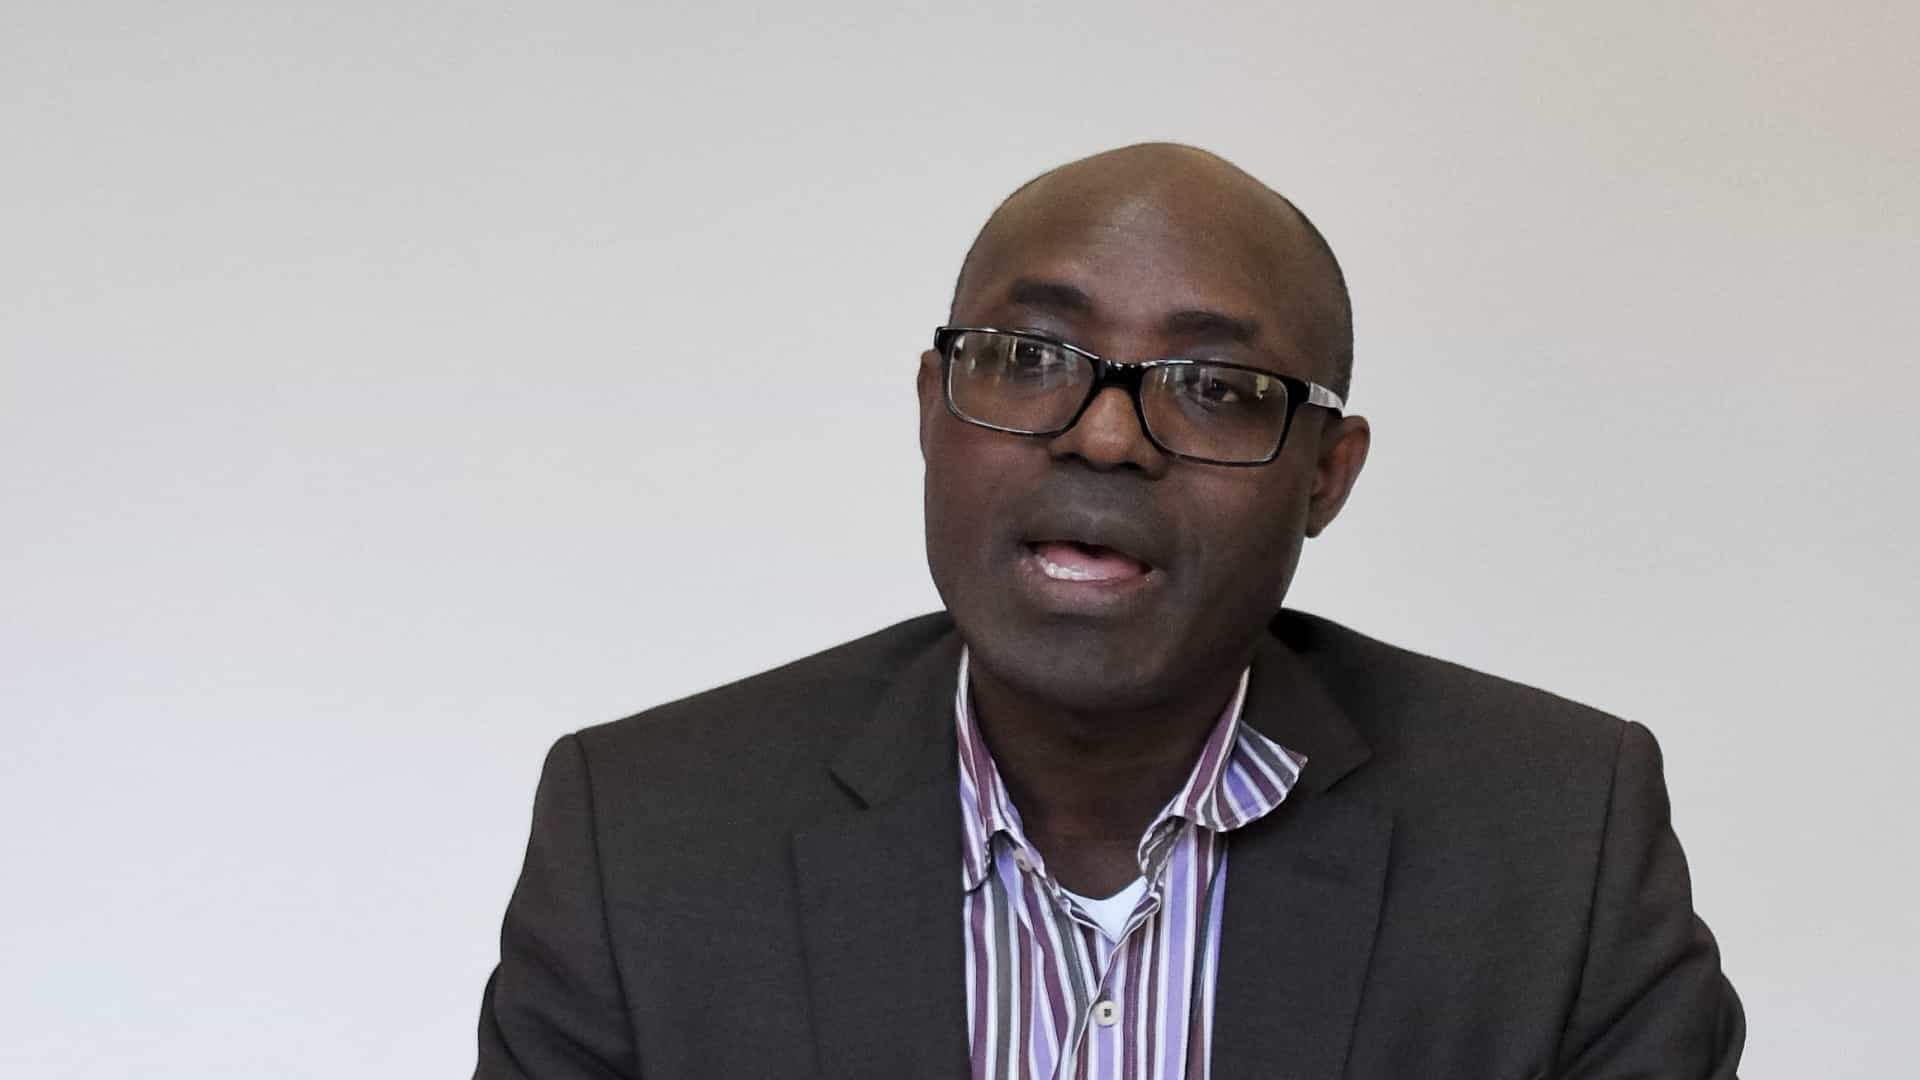 Tribunal volta a adiar julgamento do jornalista angolano Rafael Marques